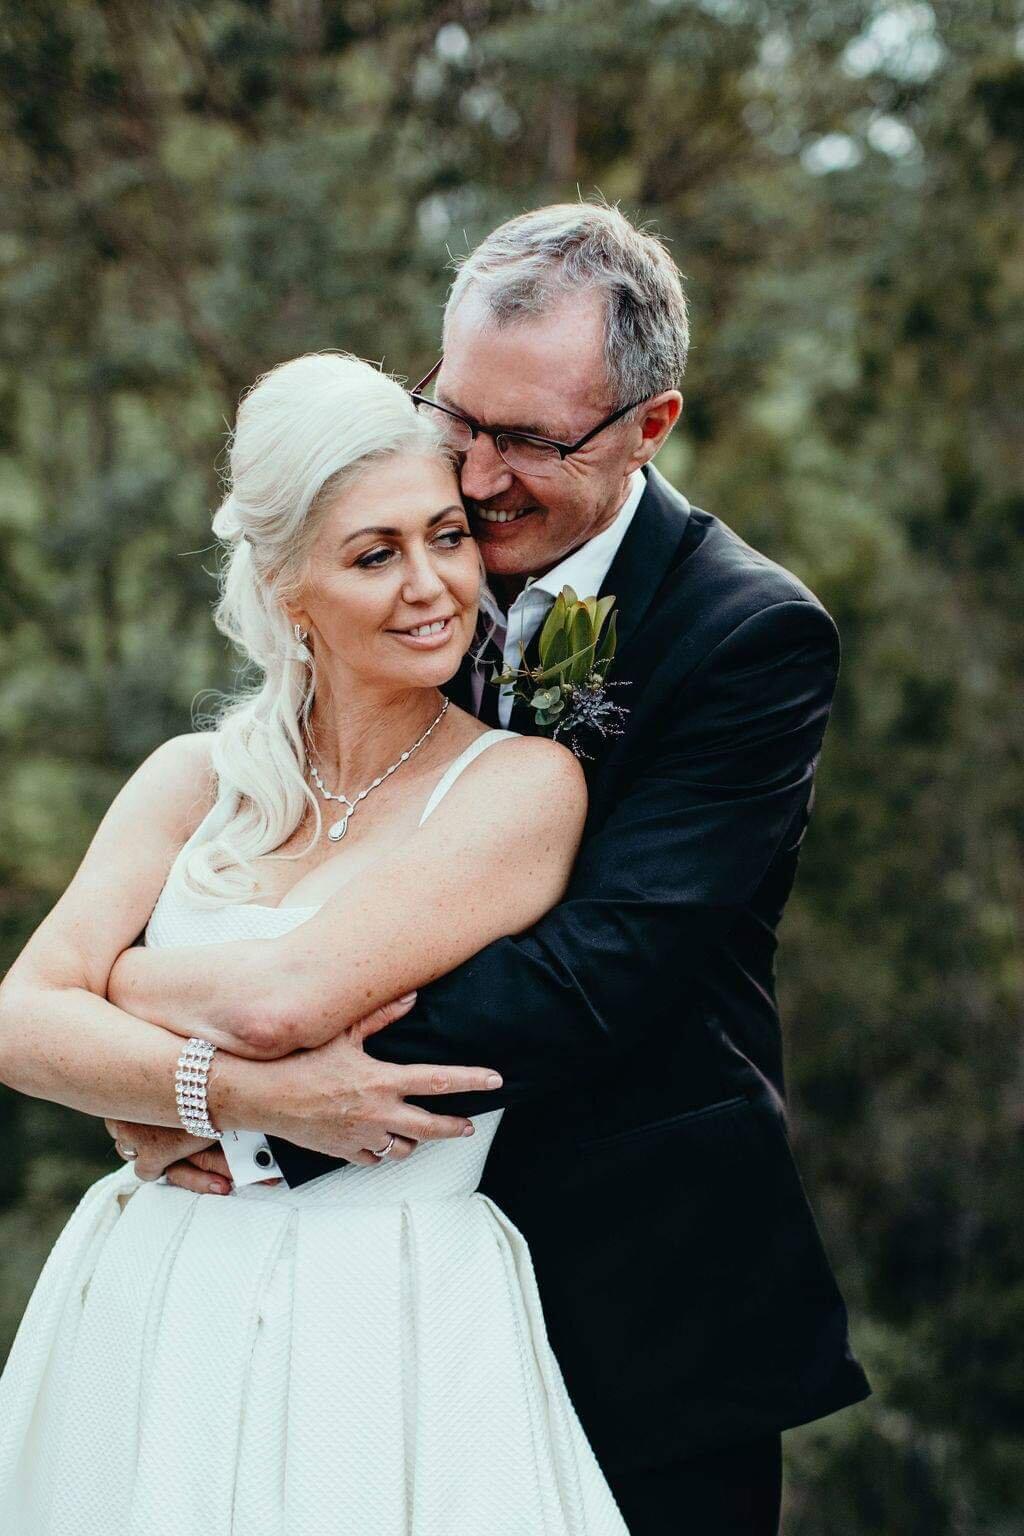 bespoke-bridal-shop-designer-helena-couture-designs-custom-wedding-dresses-gold-coast-brisbane-affordable-suzie03